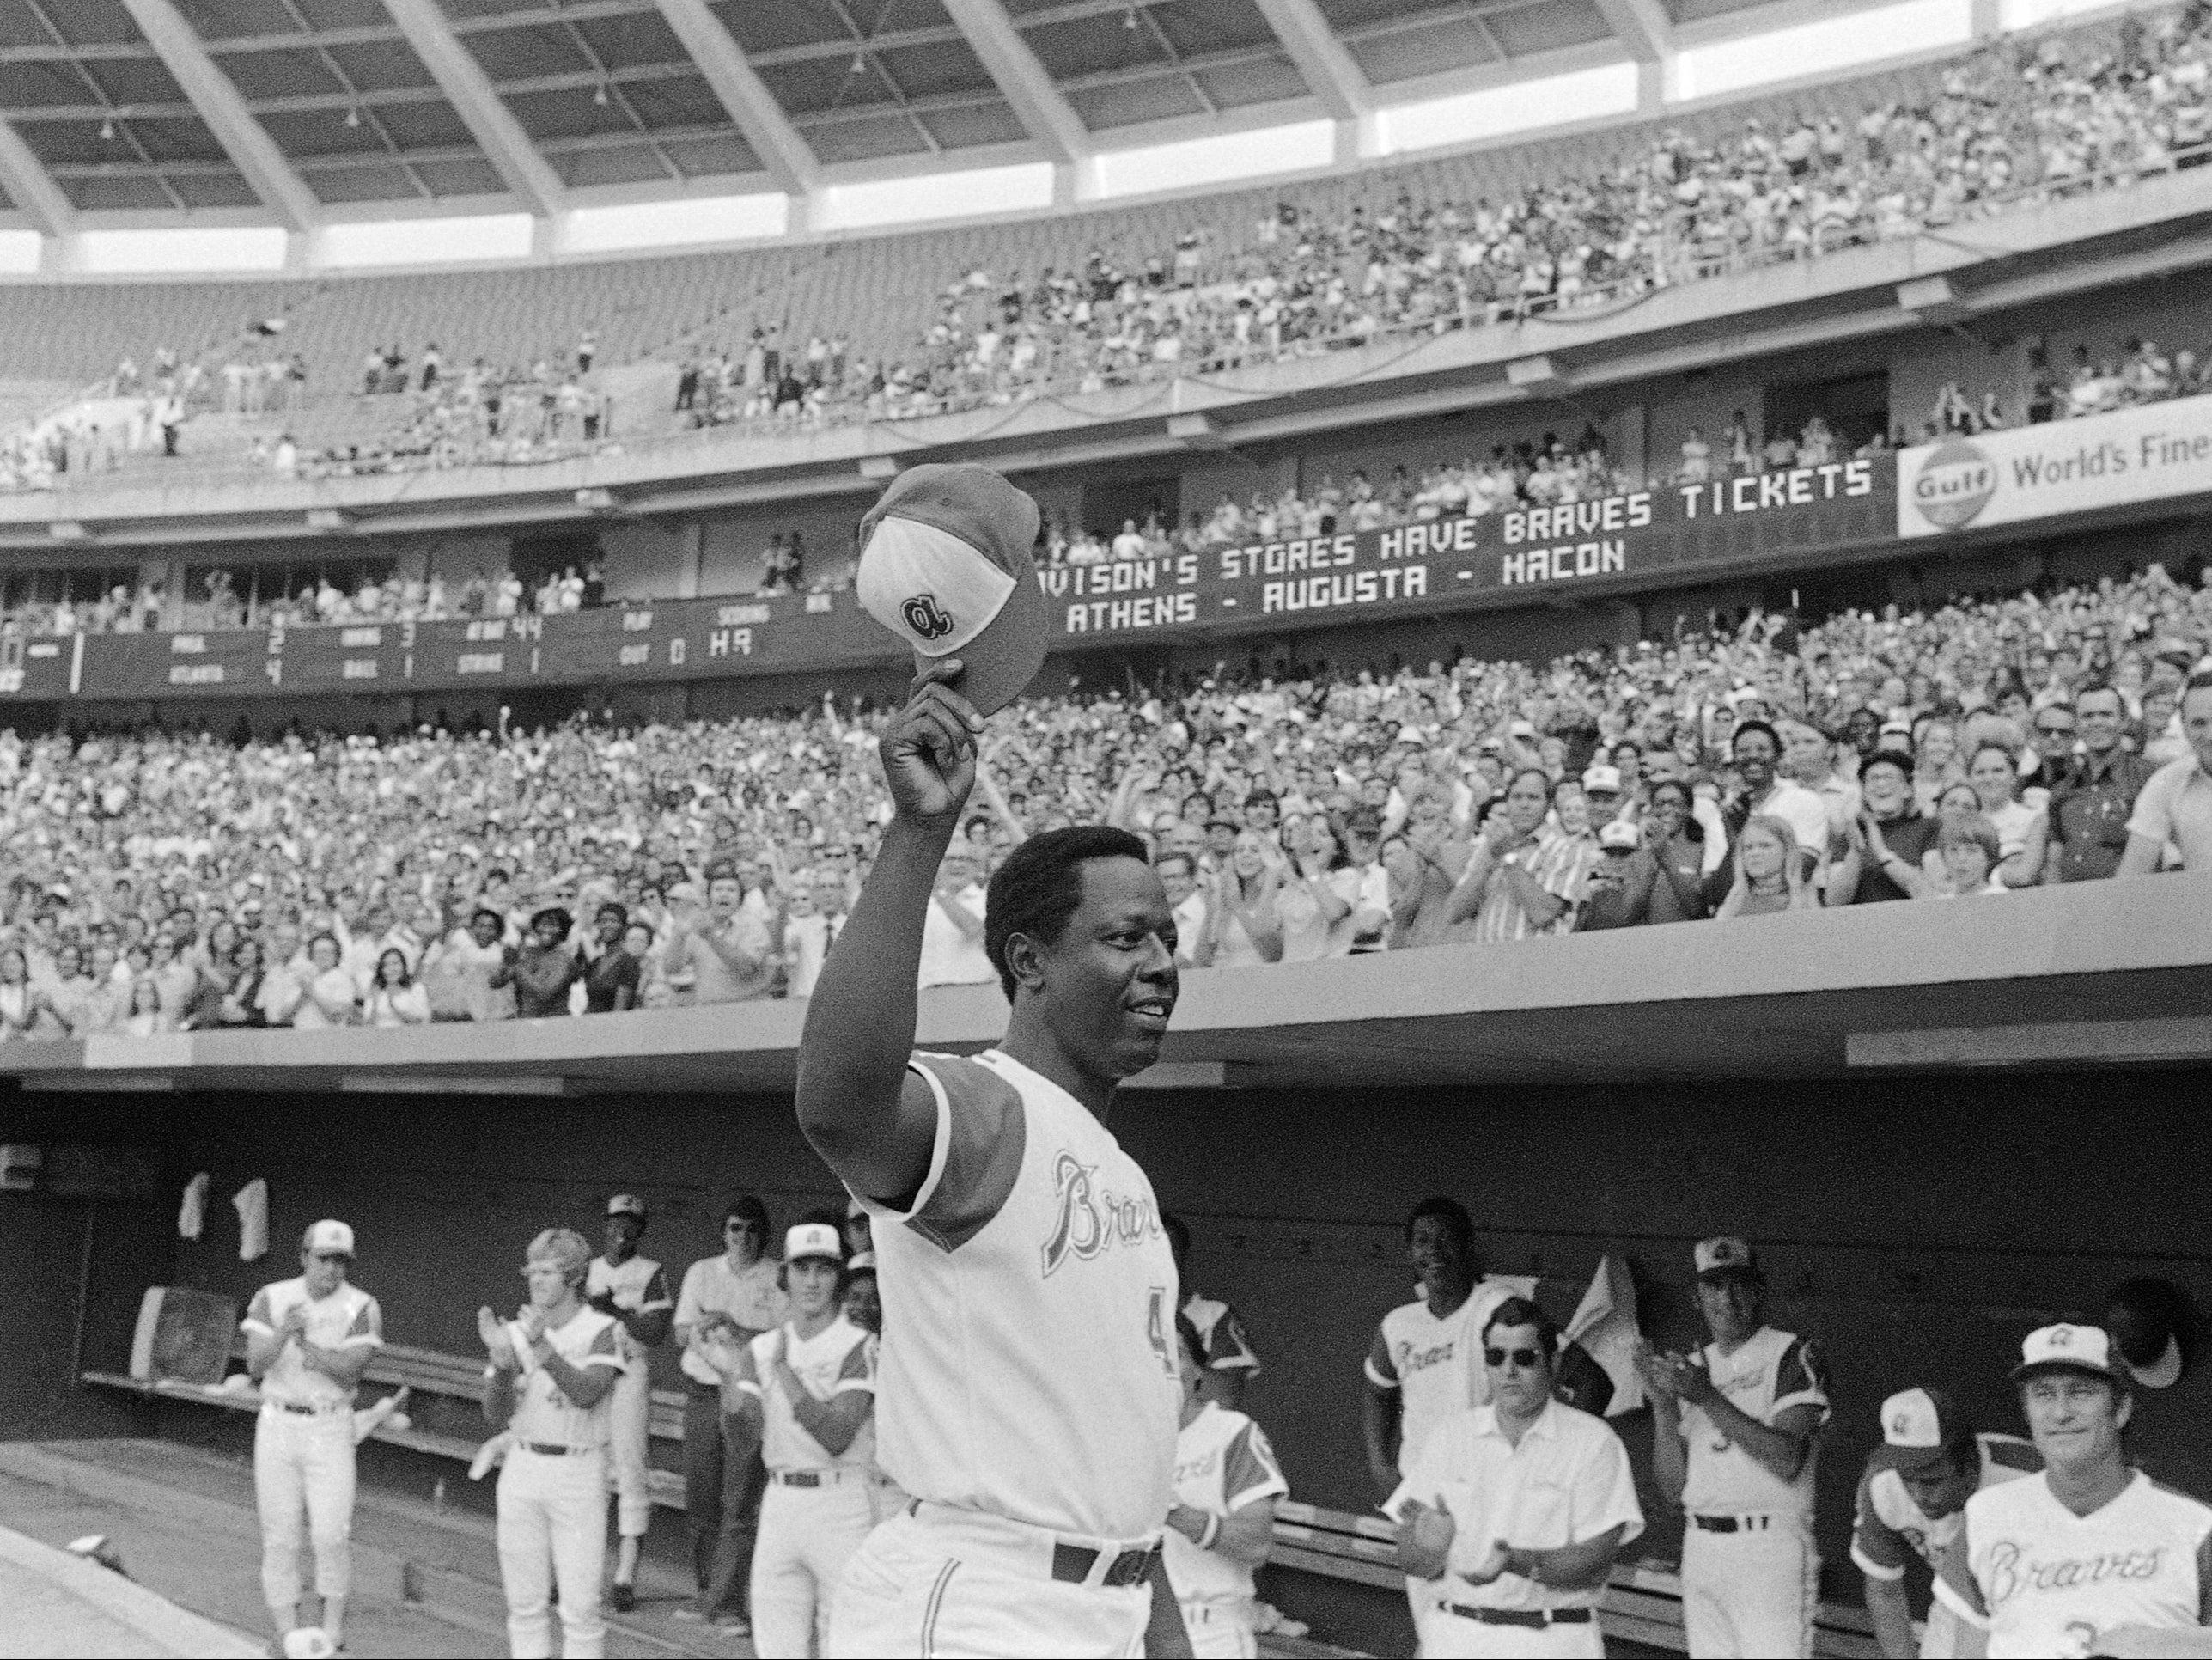 Obama leads tributes to legendary Black baseball player Hank Aaron